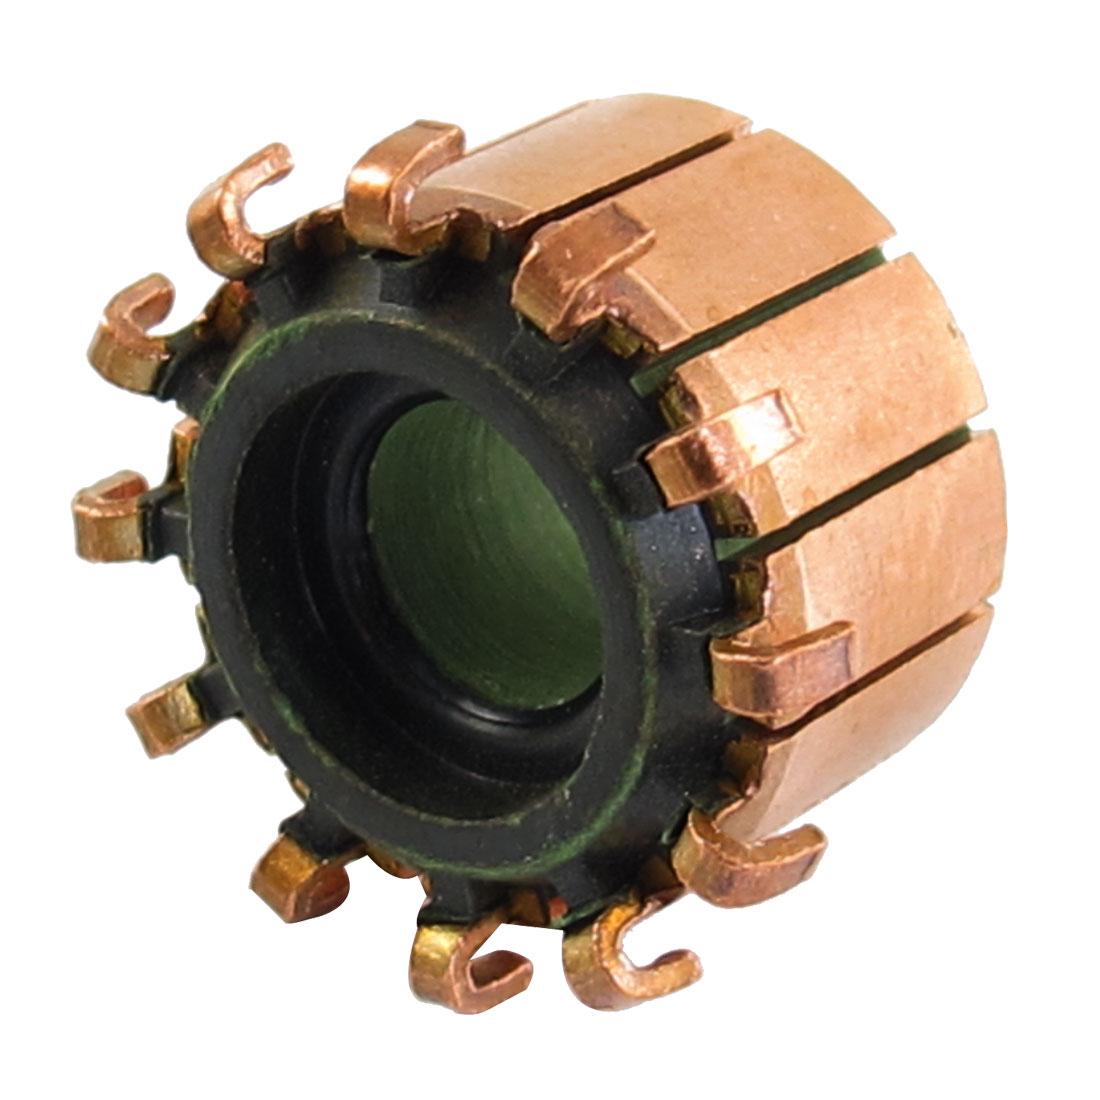 8mm x 18.9mm x 12.5mm 12P Copper Bars Alternator Electric Motor Commutator